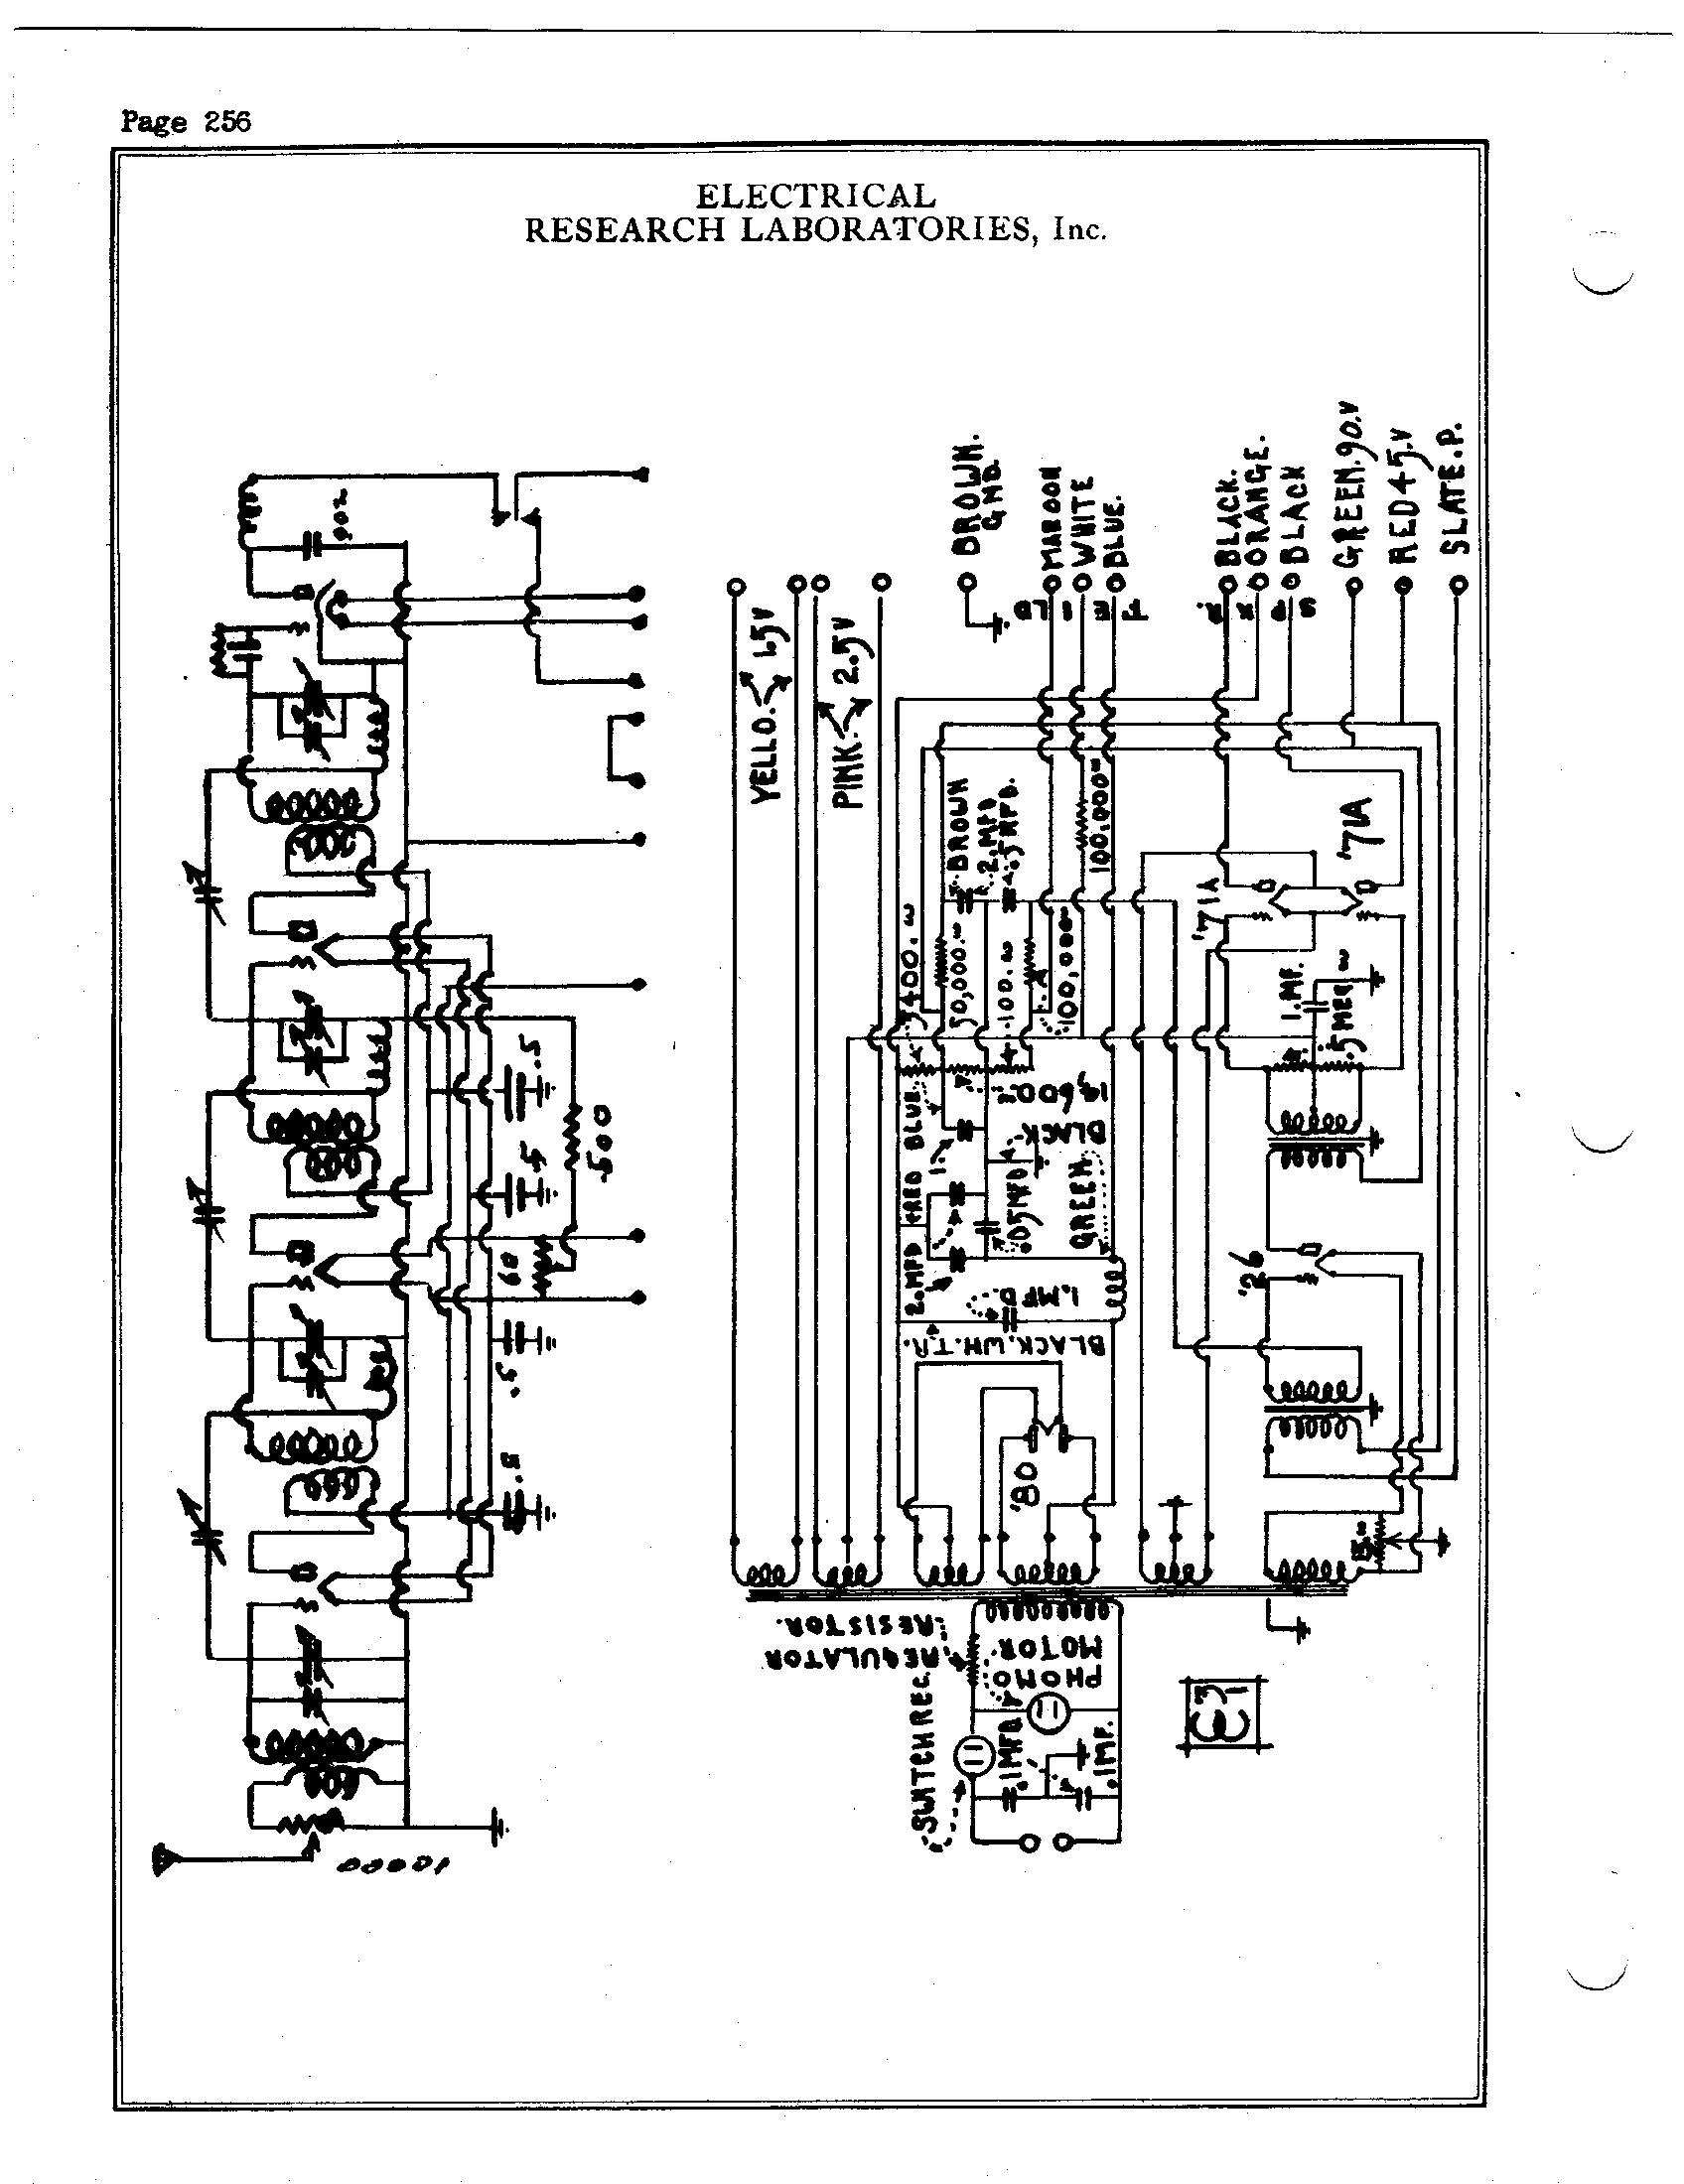 Electrical Research Lab Erla 224 A C